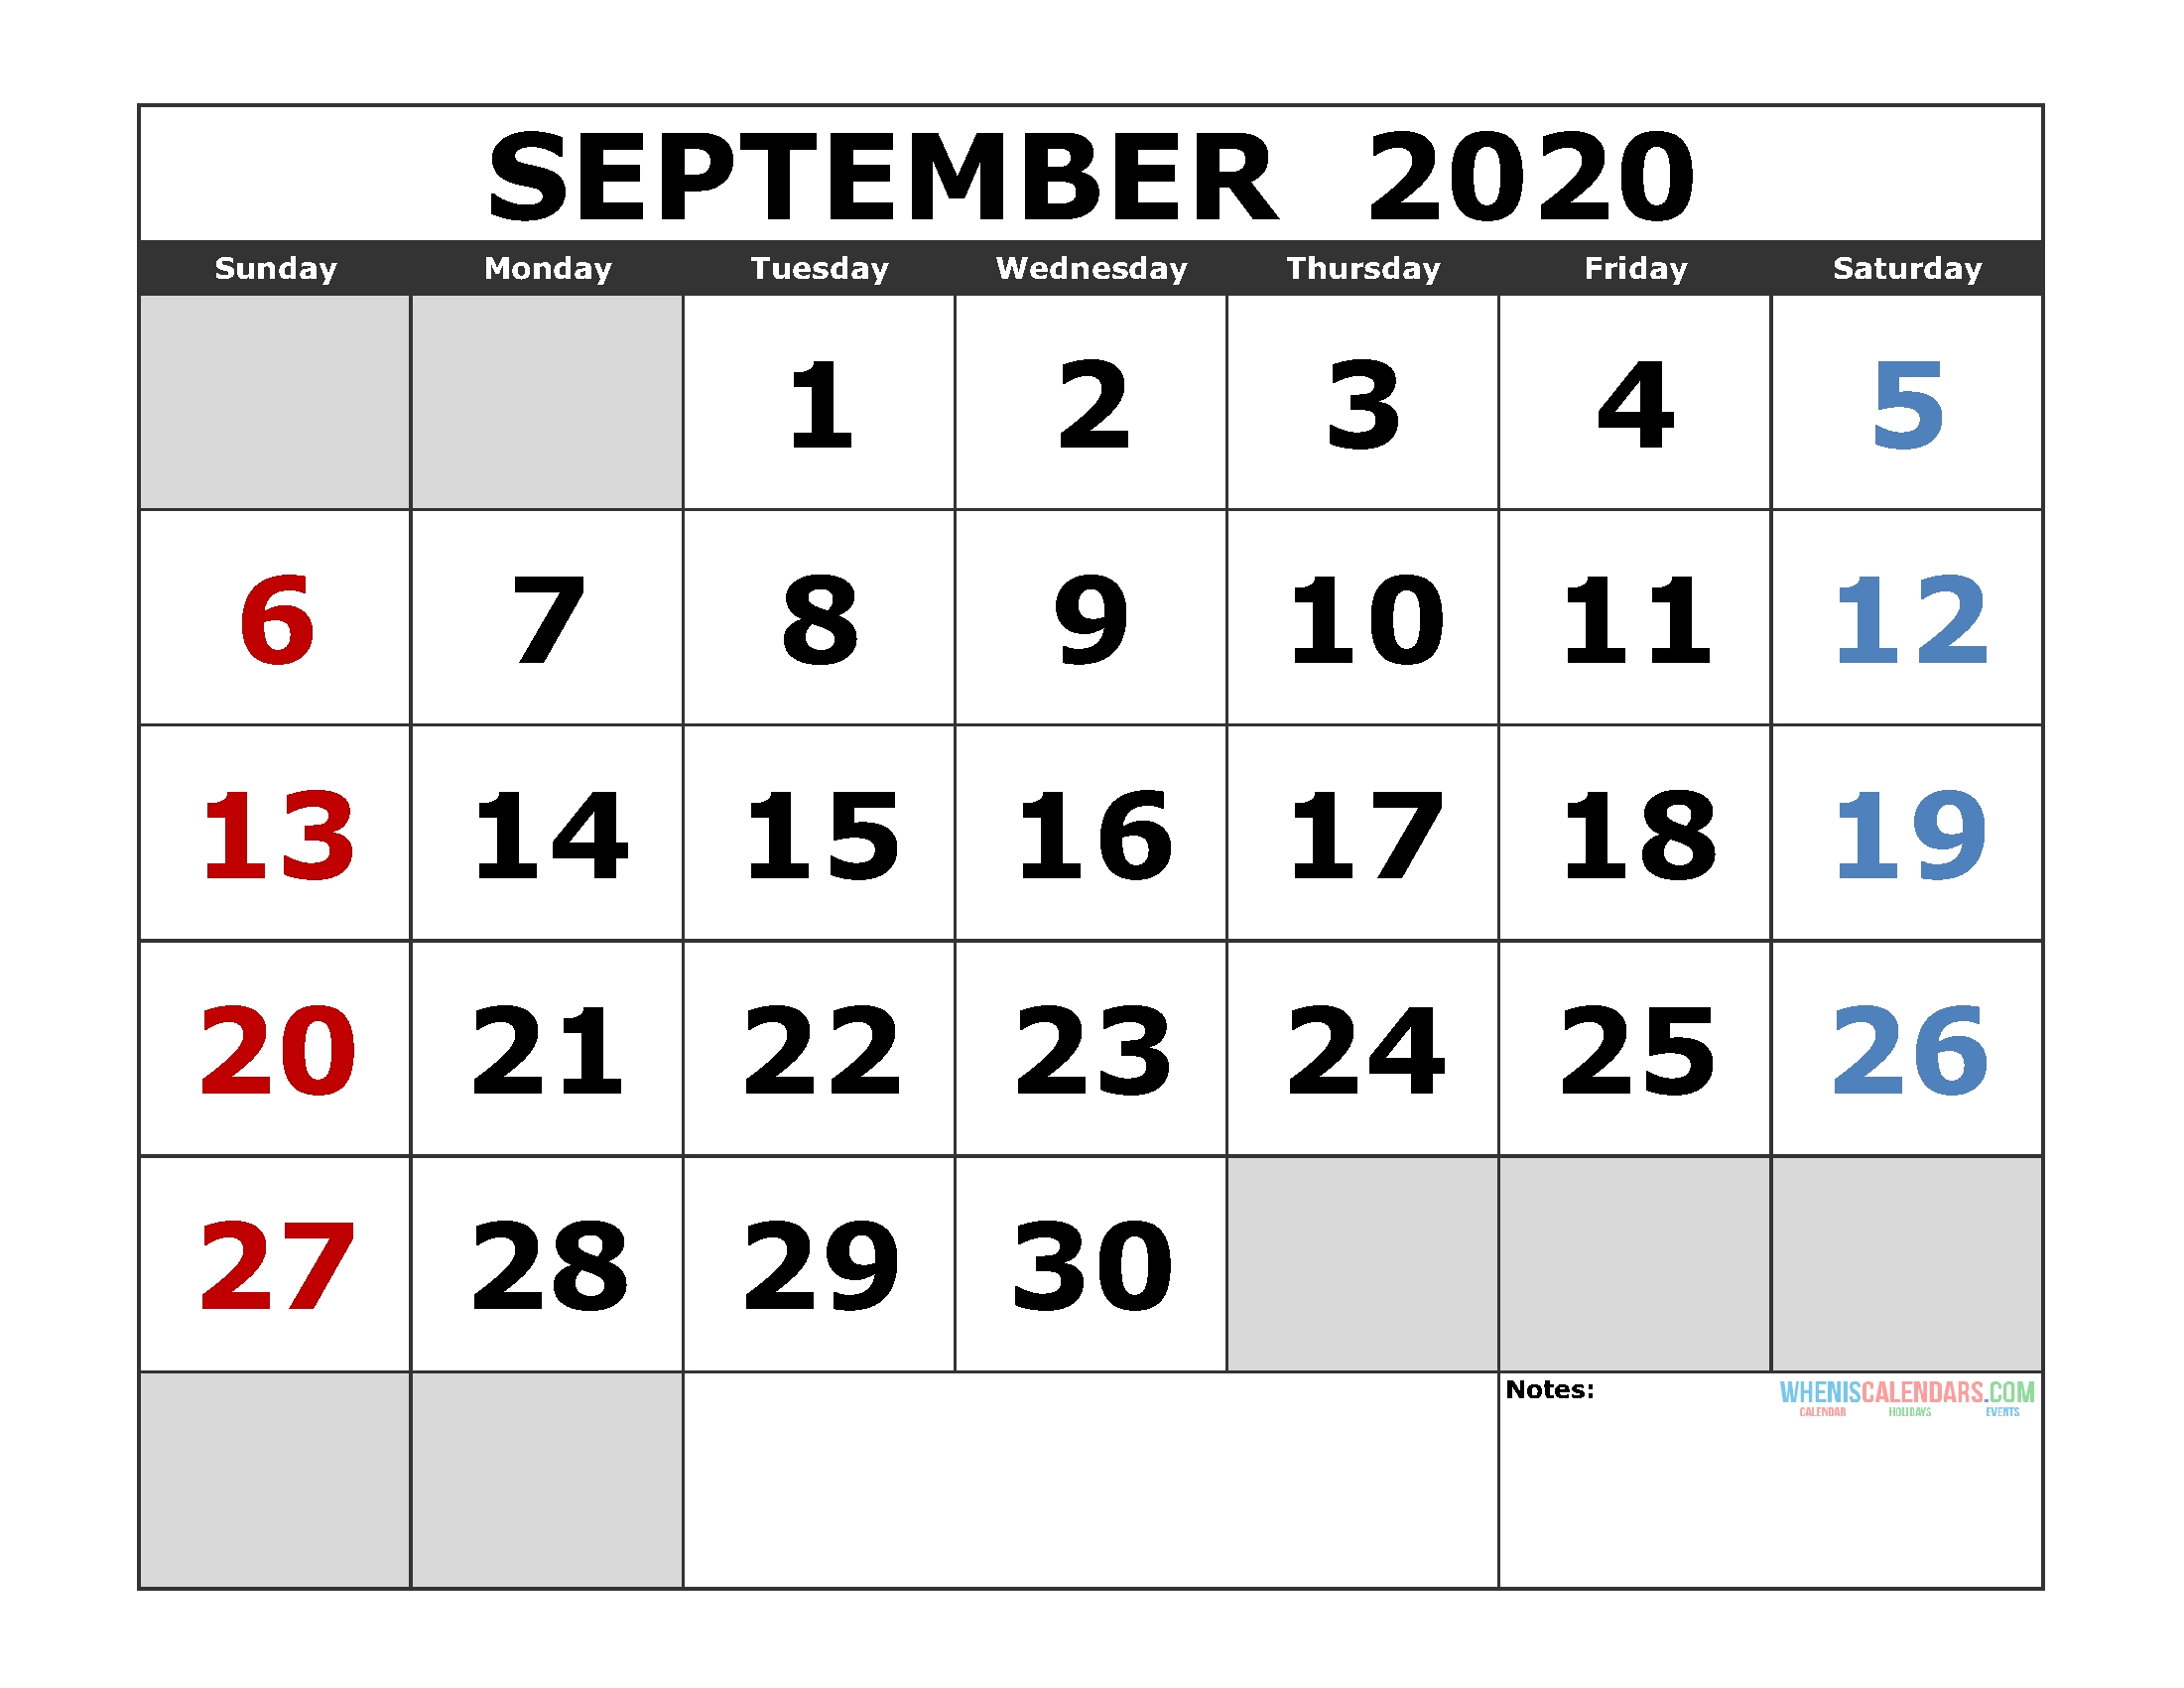 September 2020 Printable Calendar Template Excel, Pdf, Image-2020 Calendar With Jewish Holidays Pdf